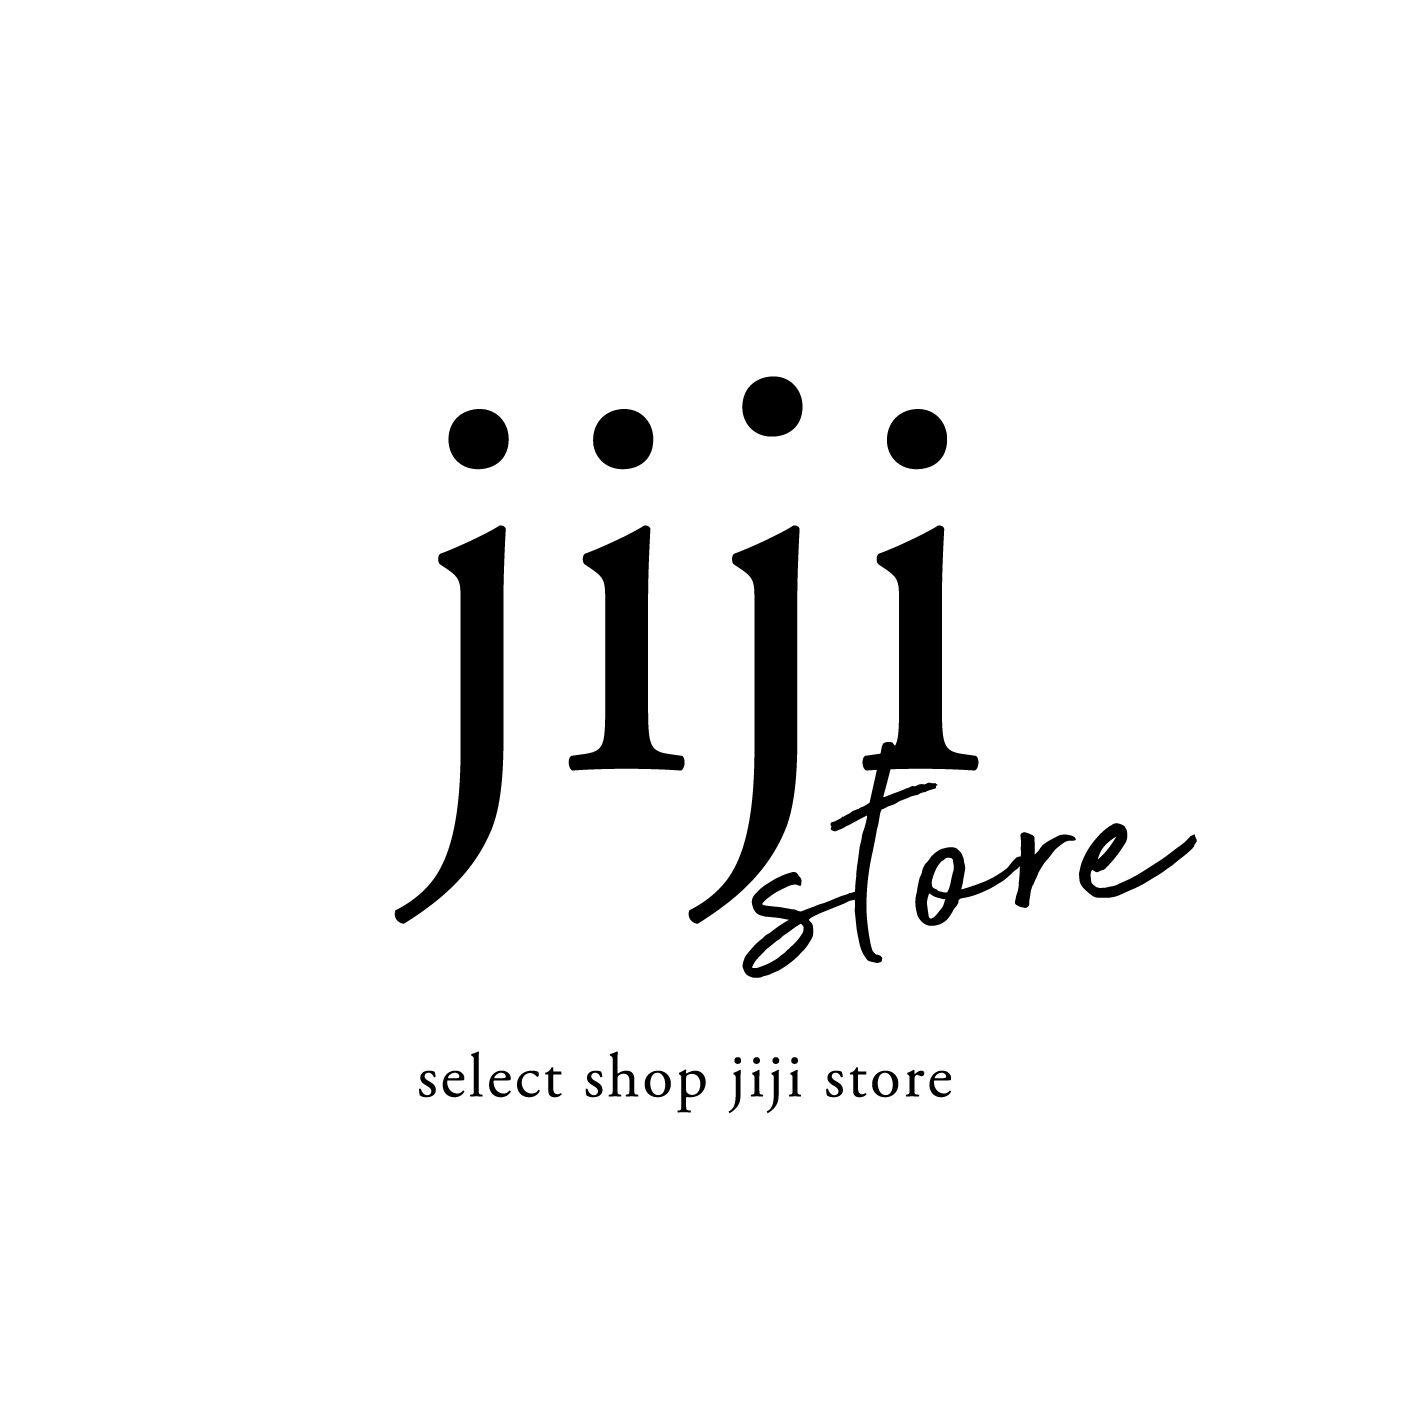 jiji store [ select shop ]